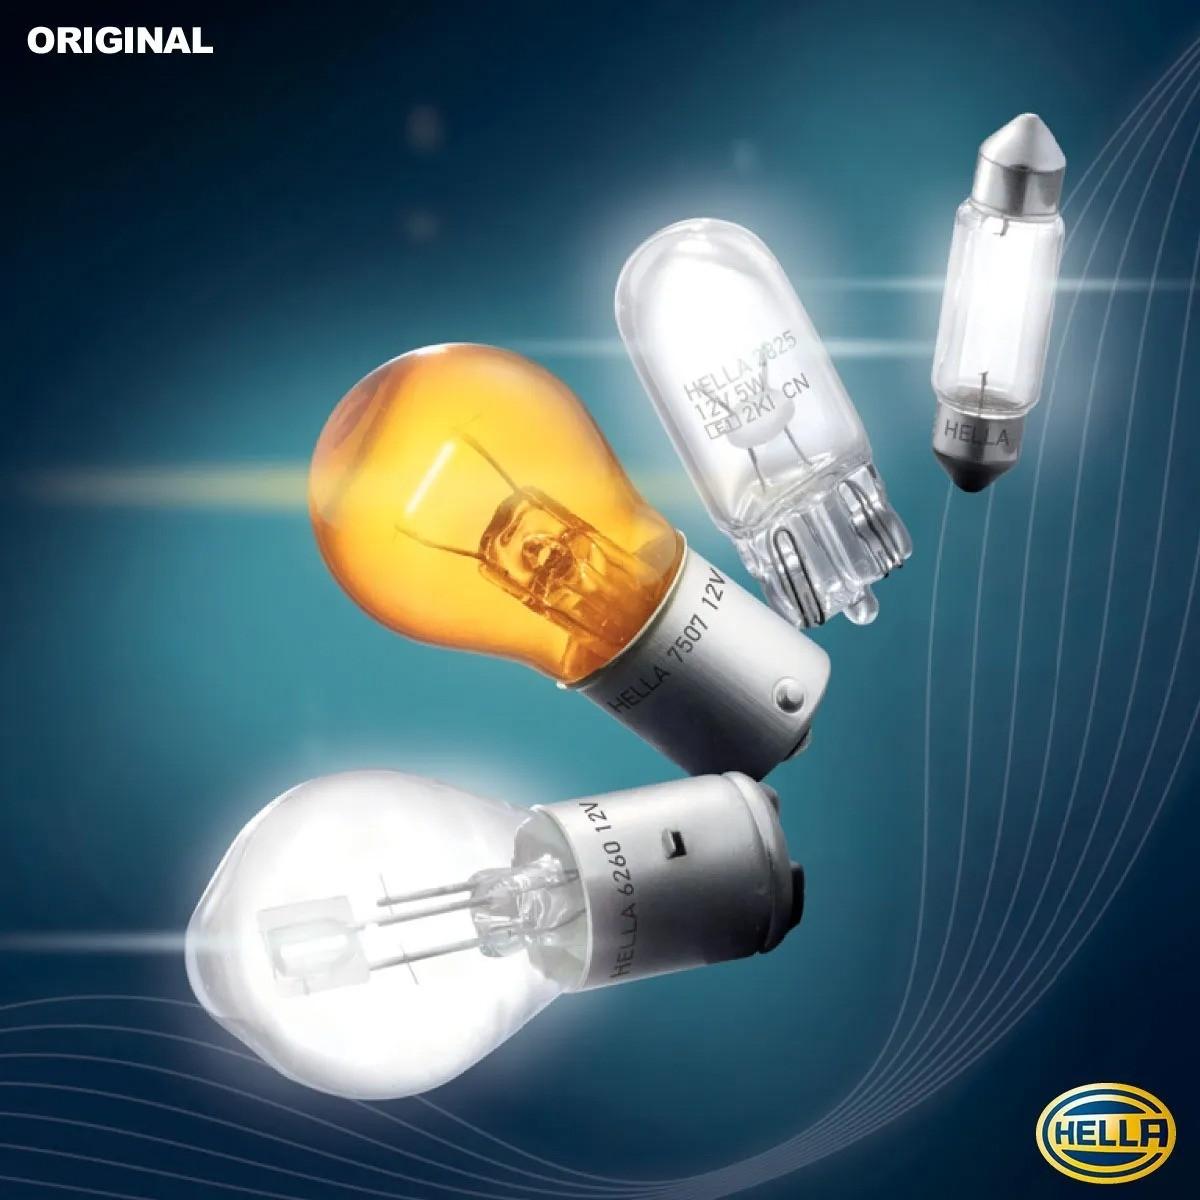 LAMPADA CONVENCIONAL 24V 70W FAROL H1 UNIVERSAL HELLA